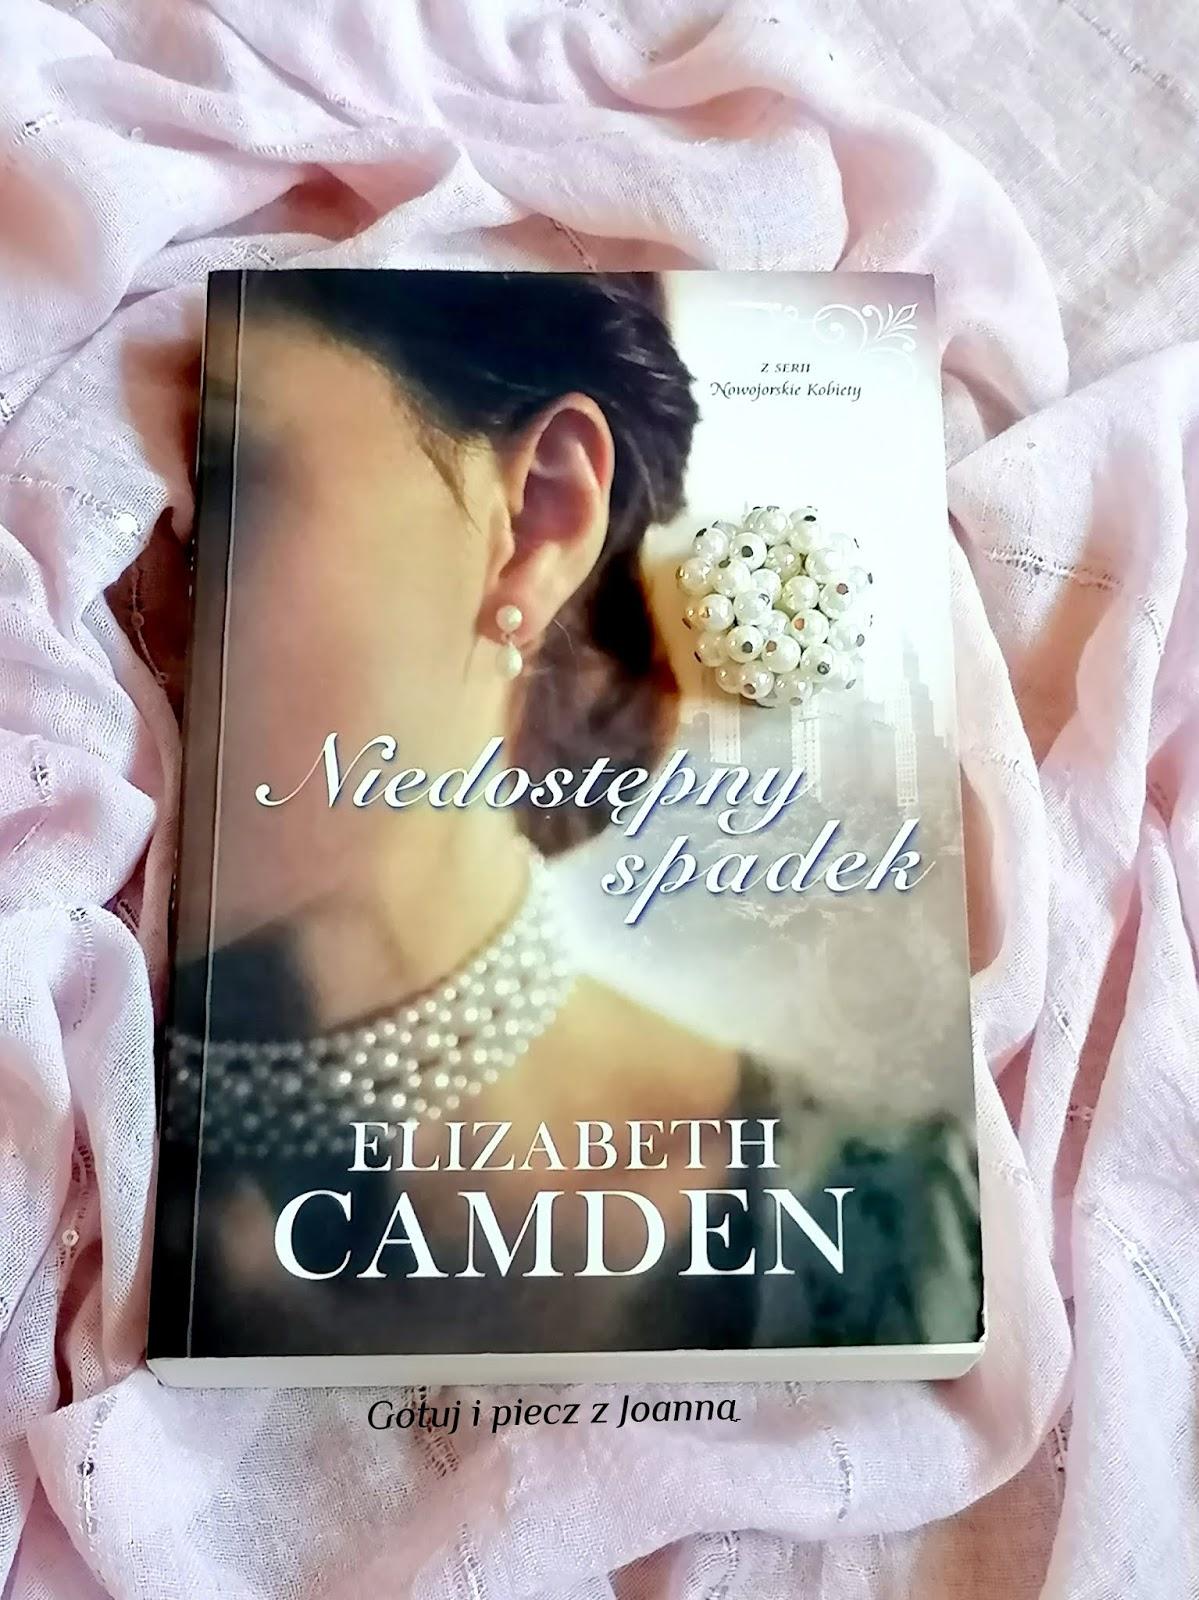 Niedostępny spadek, Seria Nowojorskie Kobiety Elizabeth Camden